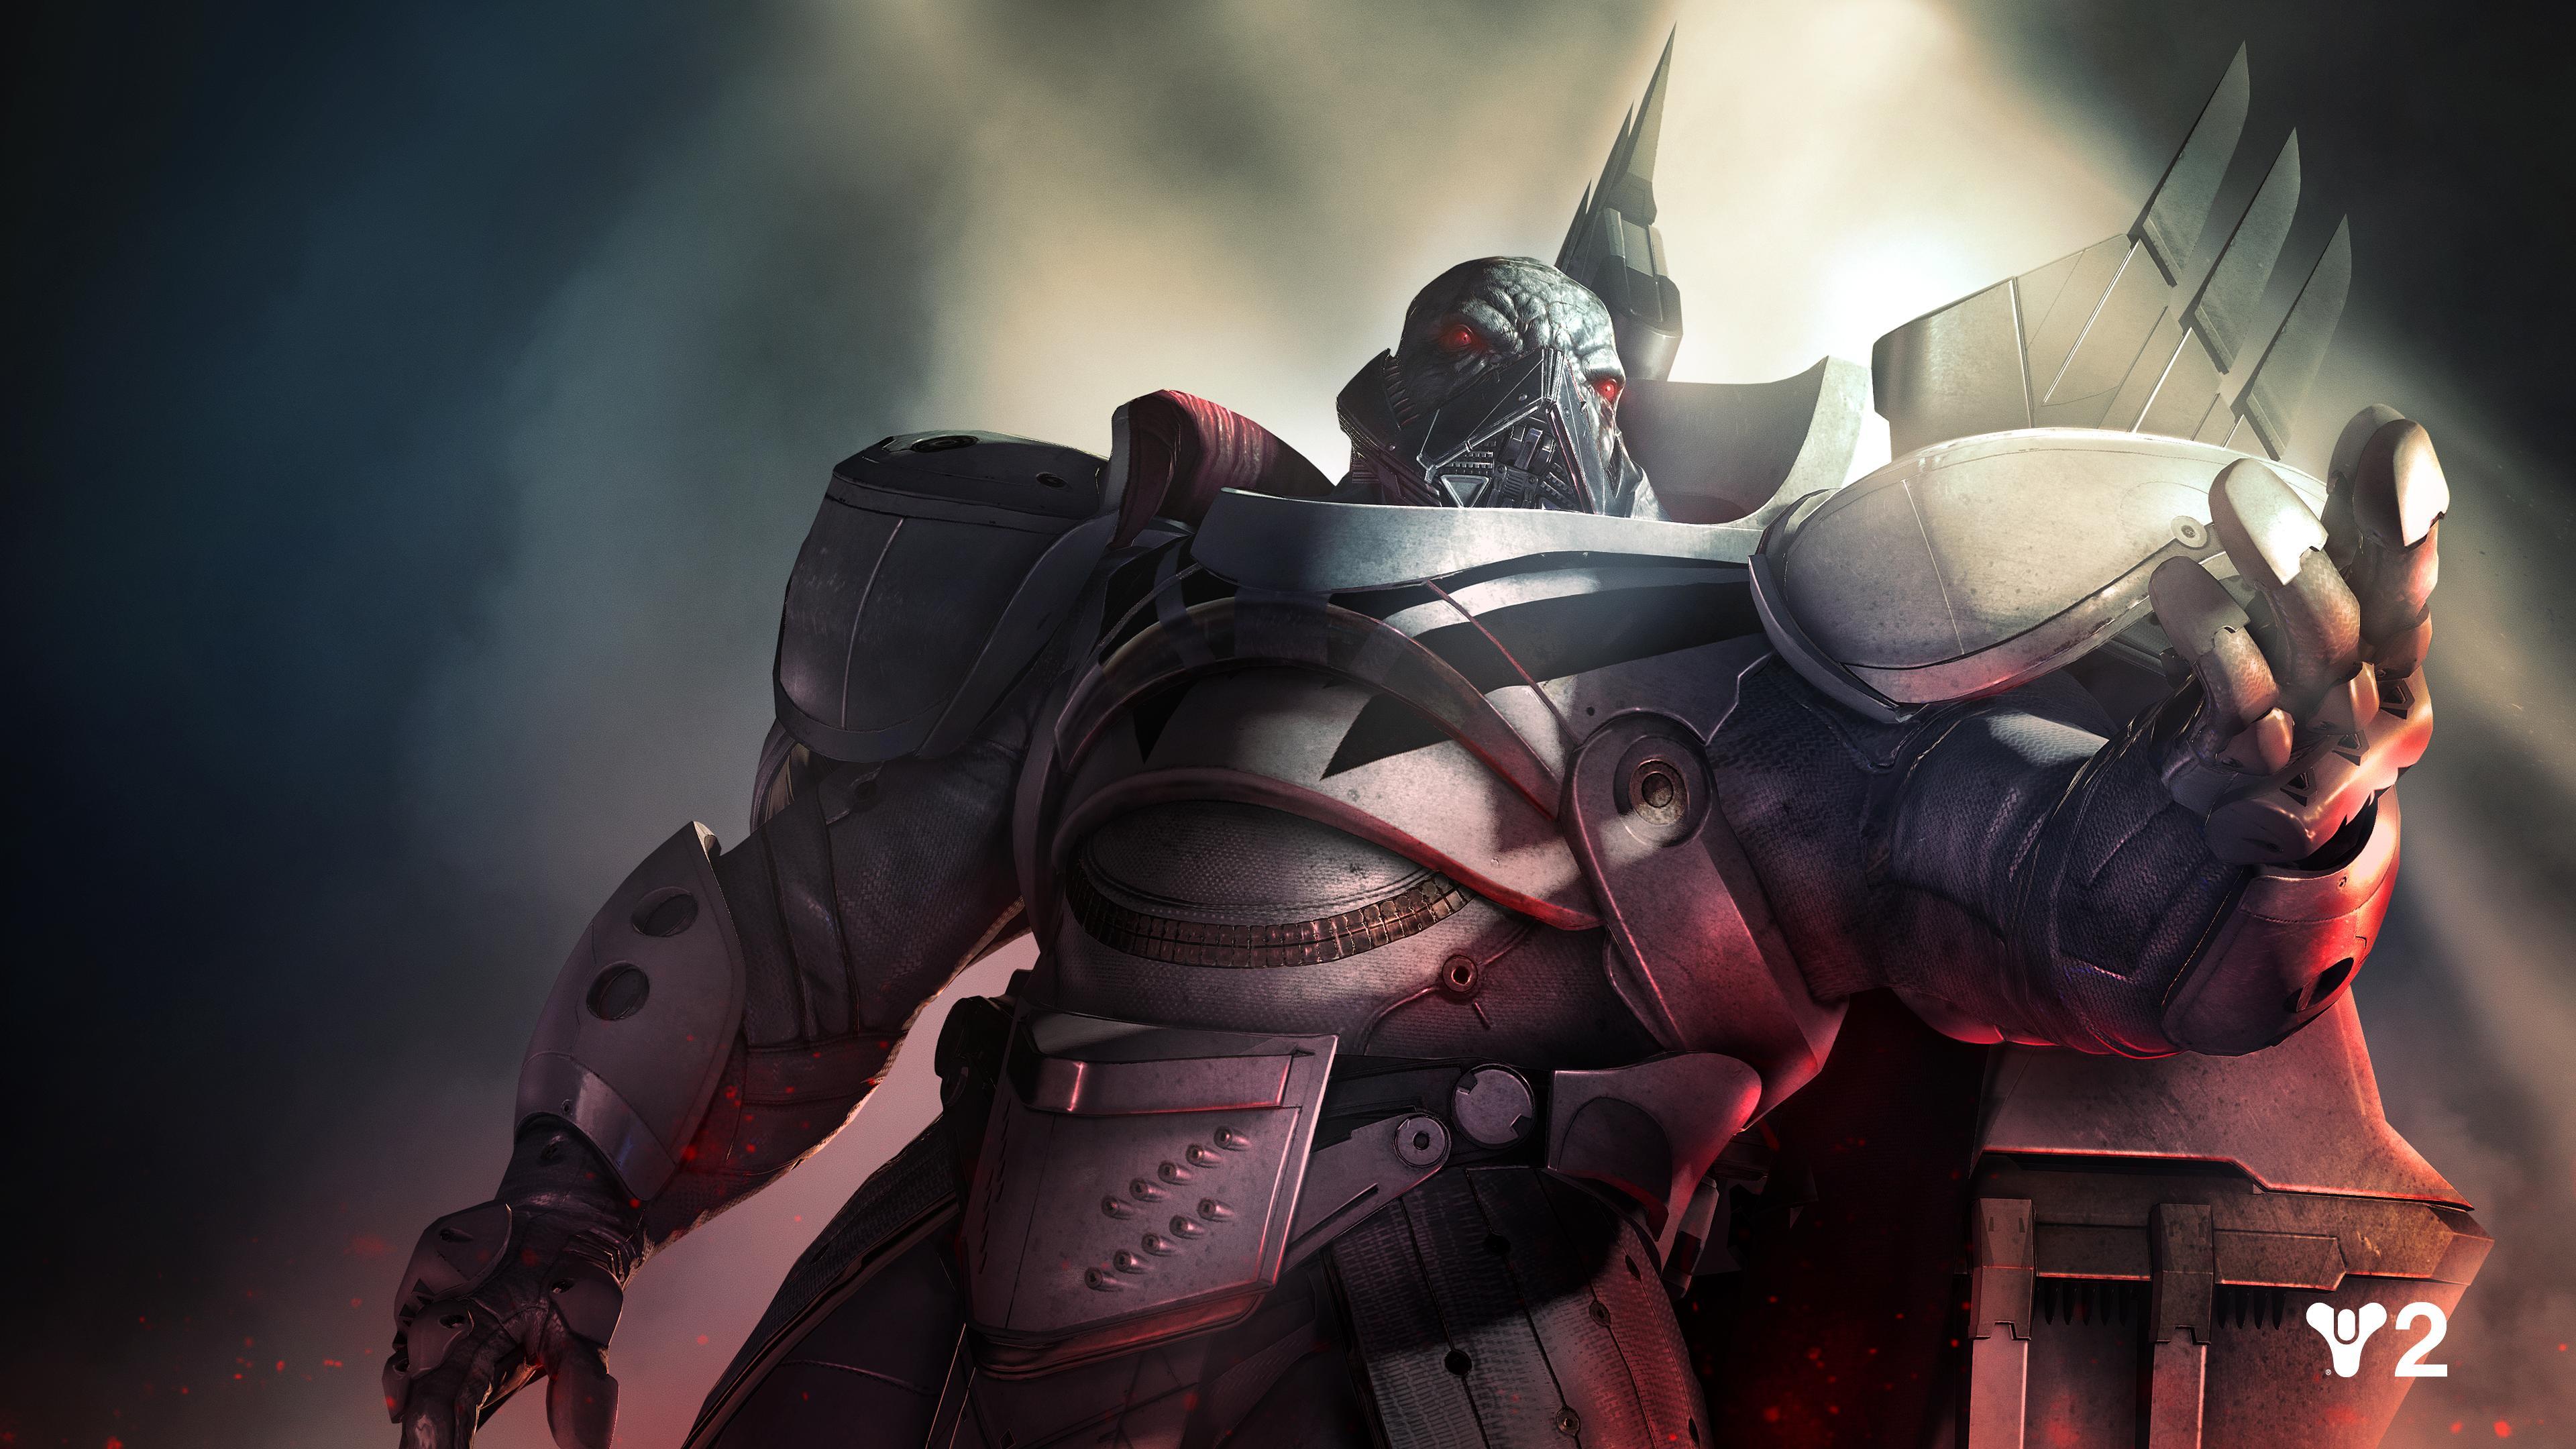 Destiny 2 ghaul hd games 4k wallpapers images - 4k destiny 2 wallpaper ...